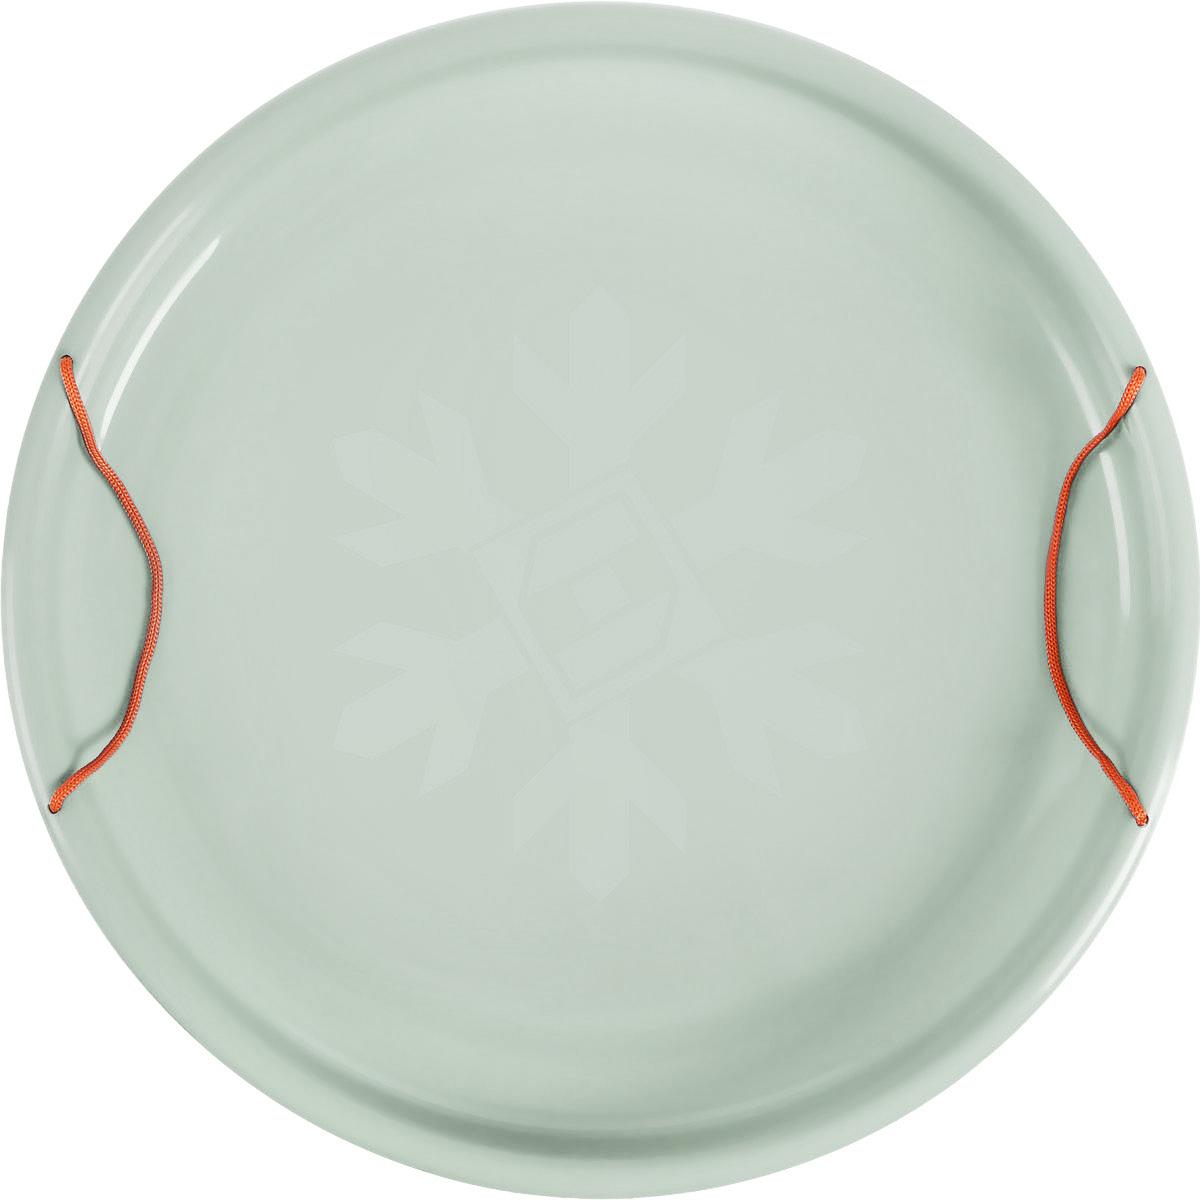 "Санки-ледянки Престиж ""Экстрим"", цвет: светло-серый, диаметр 53 см"